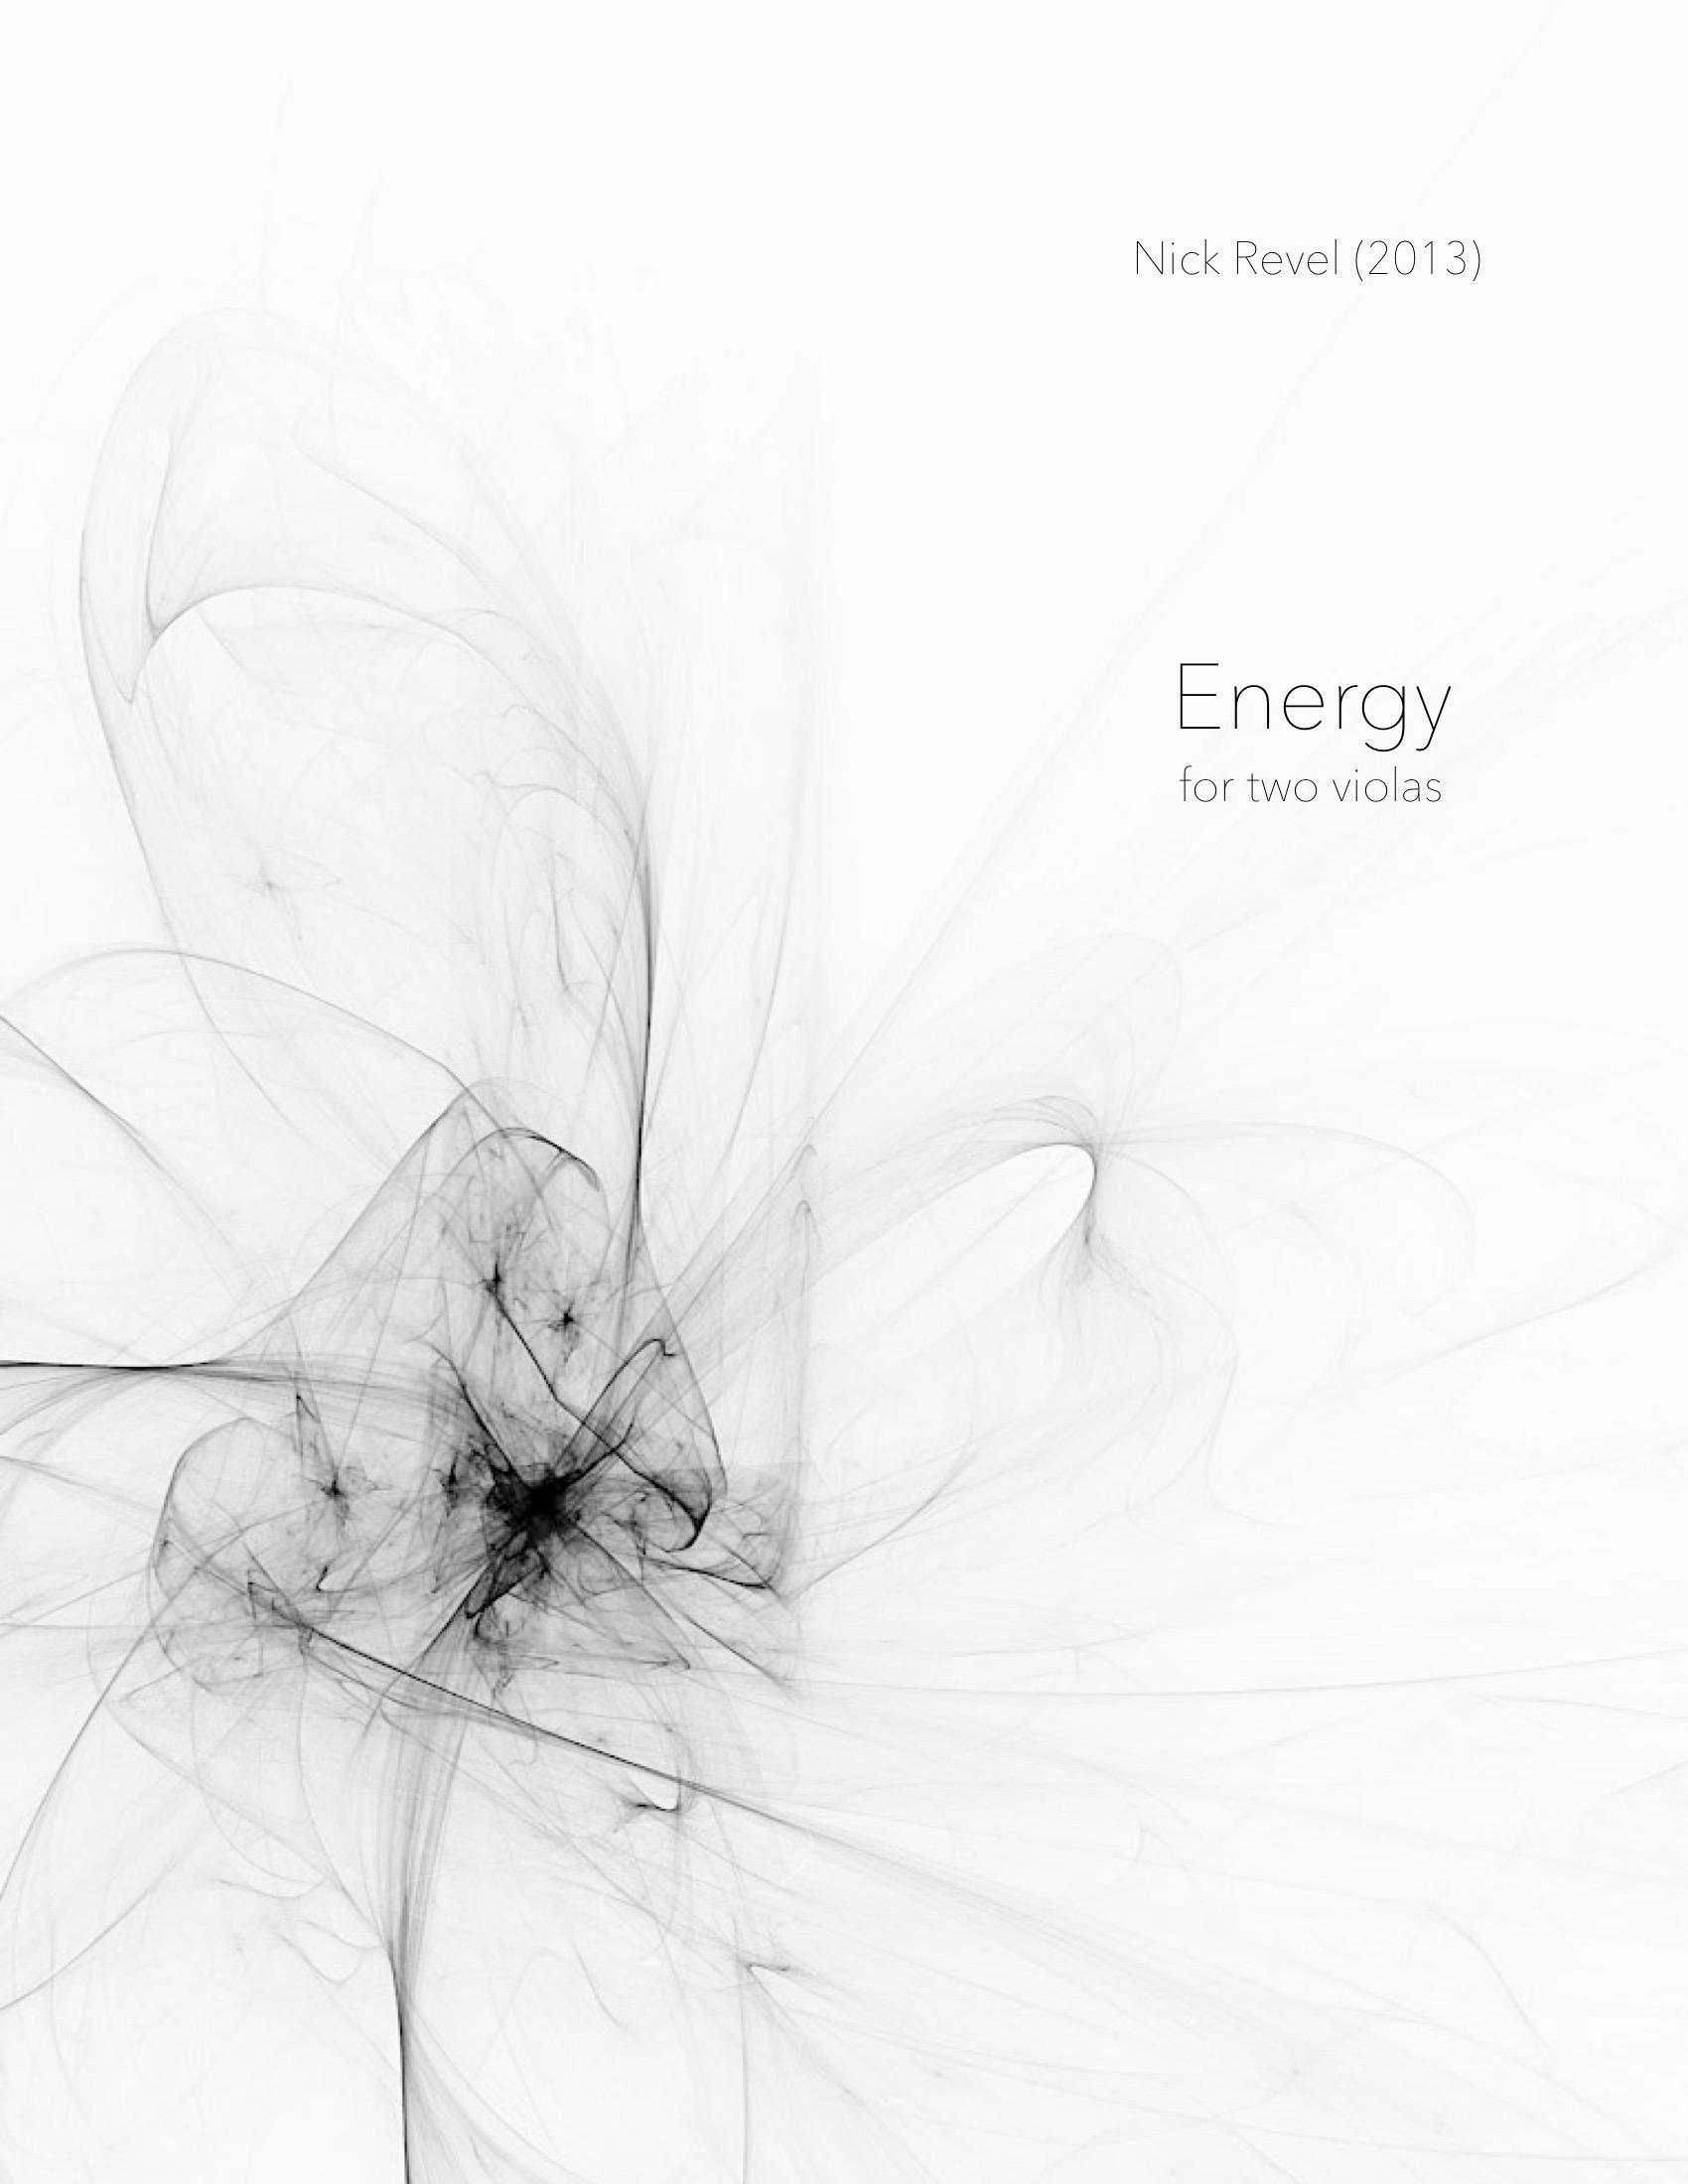 Energy for 2 violas, score, 10.1.17 1.jpeg